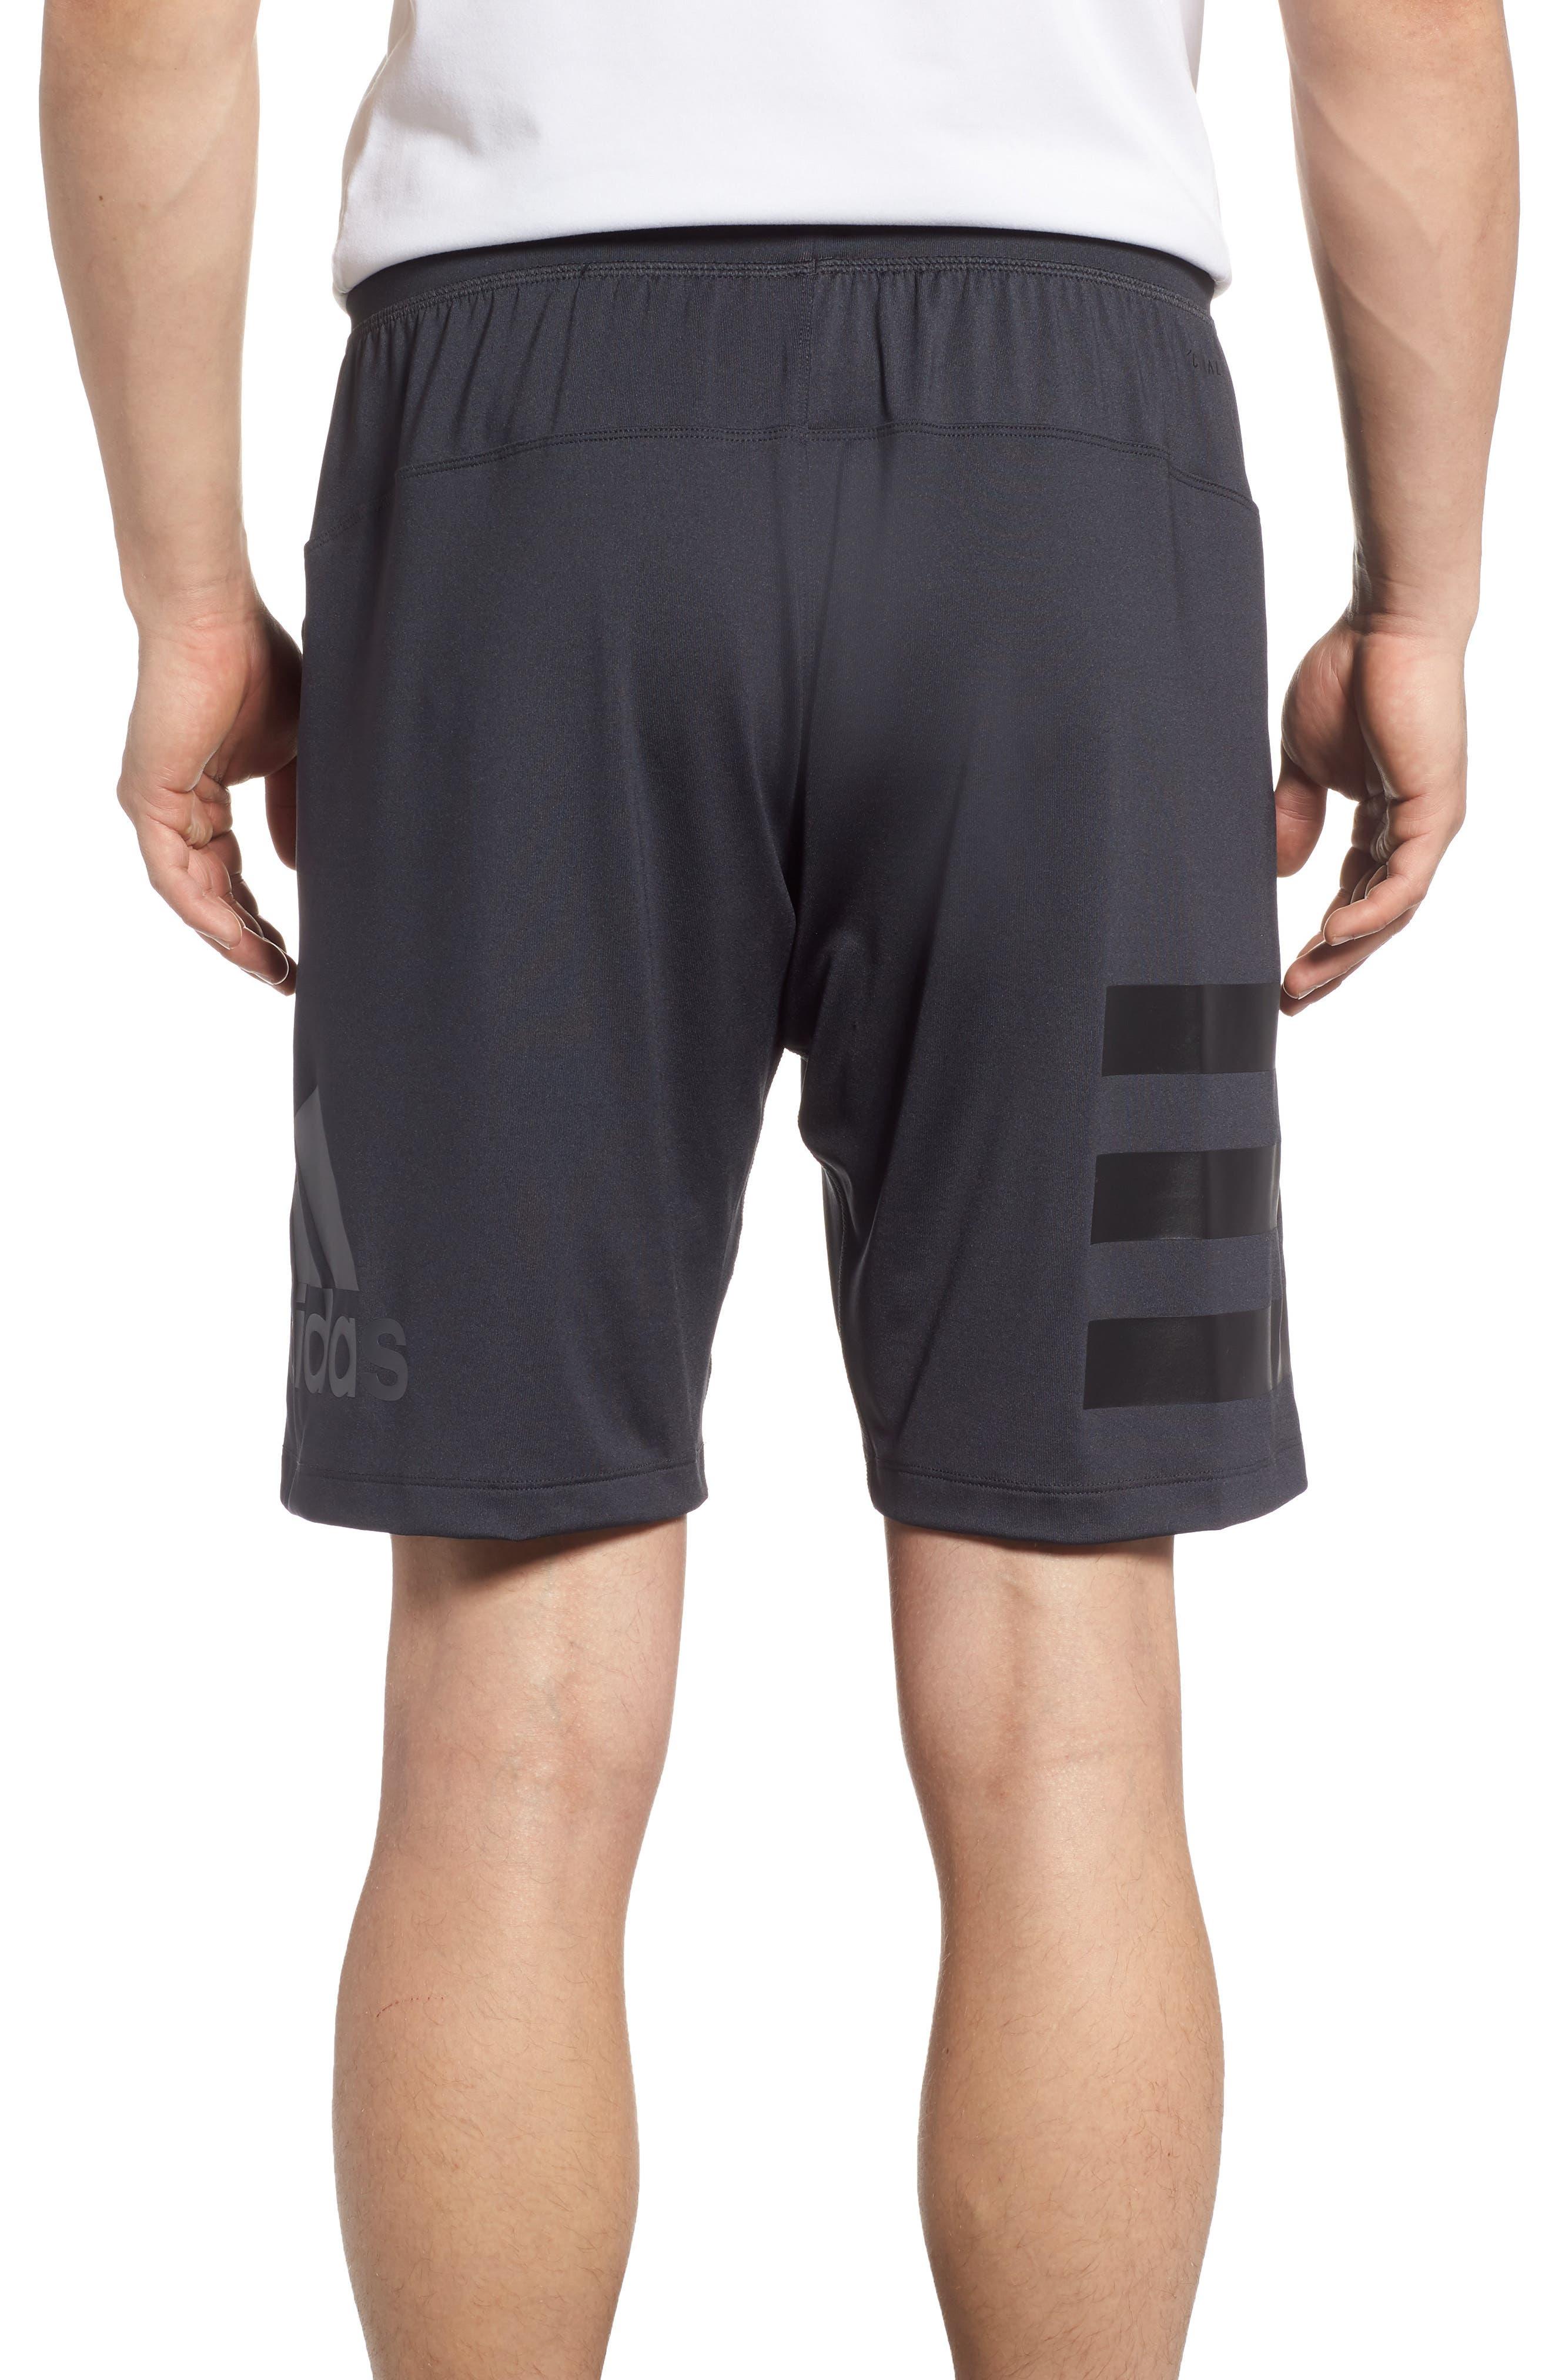 SB Hype Icon Shorts,                             Alternate thumbnail 2, color,                             CARBON/ BLACK